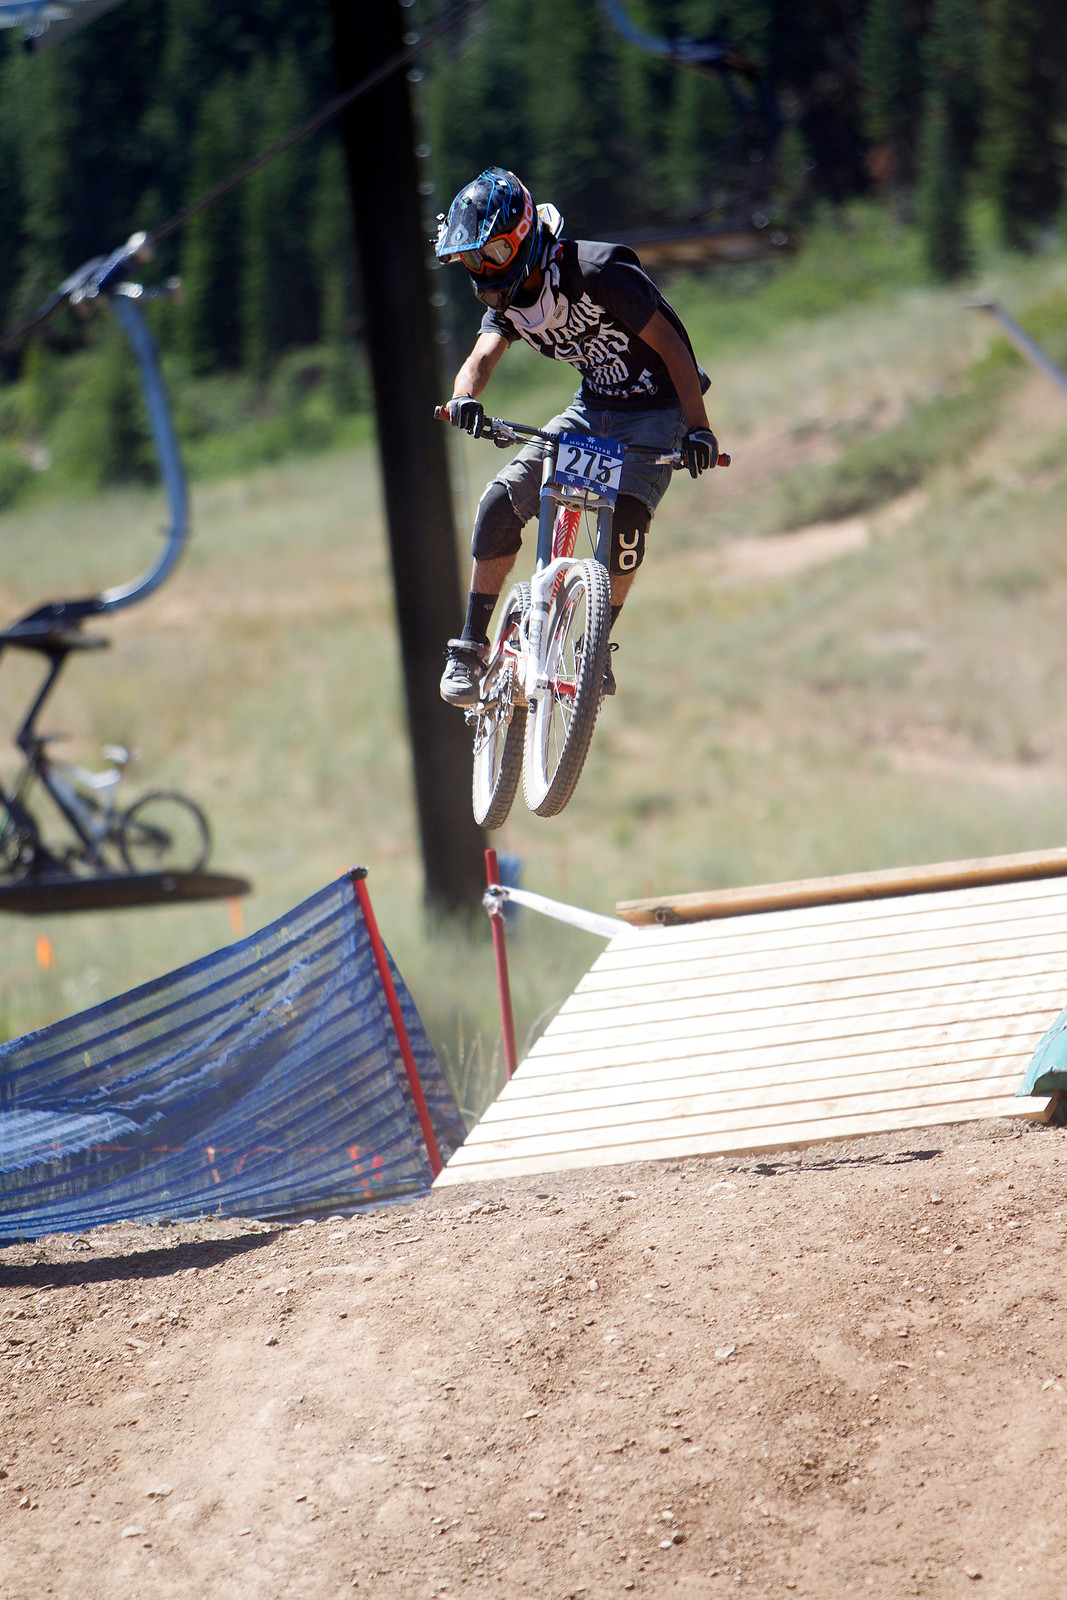 Northstar ProGrt 2012 Practice - alexgnzlz20 - Mountain Biking Pictures - Vital MTB